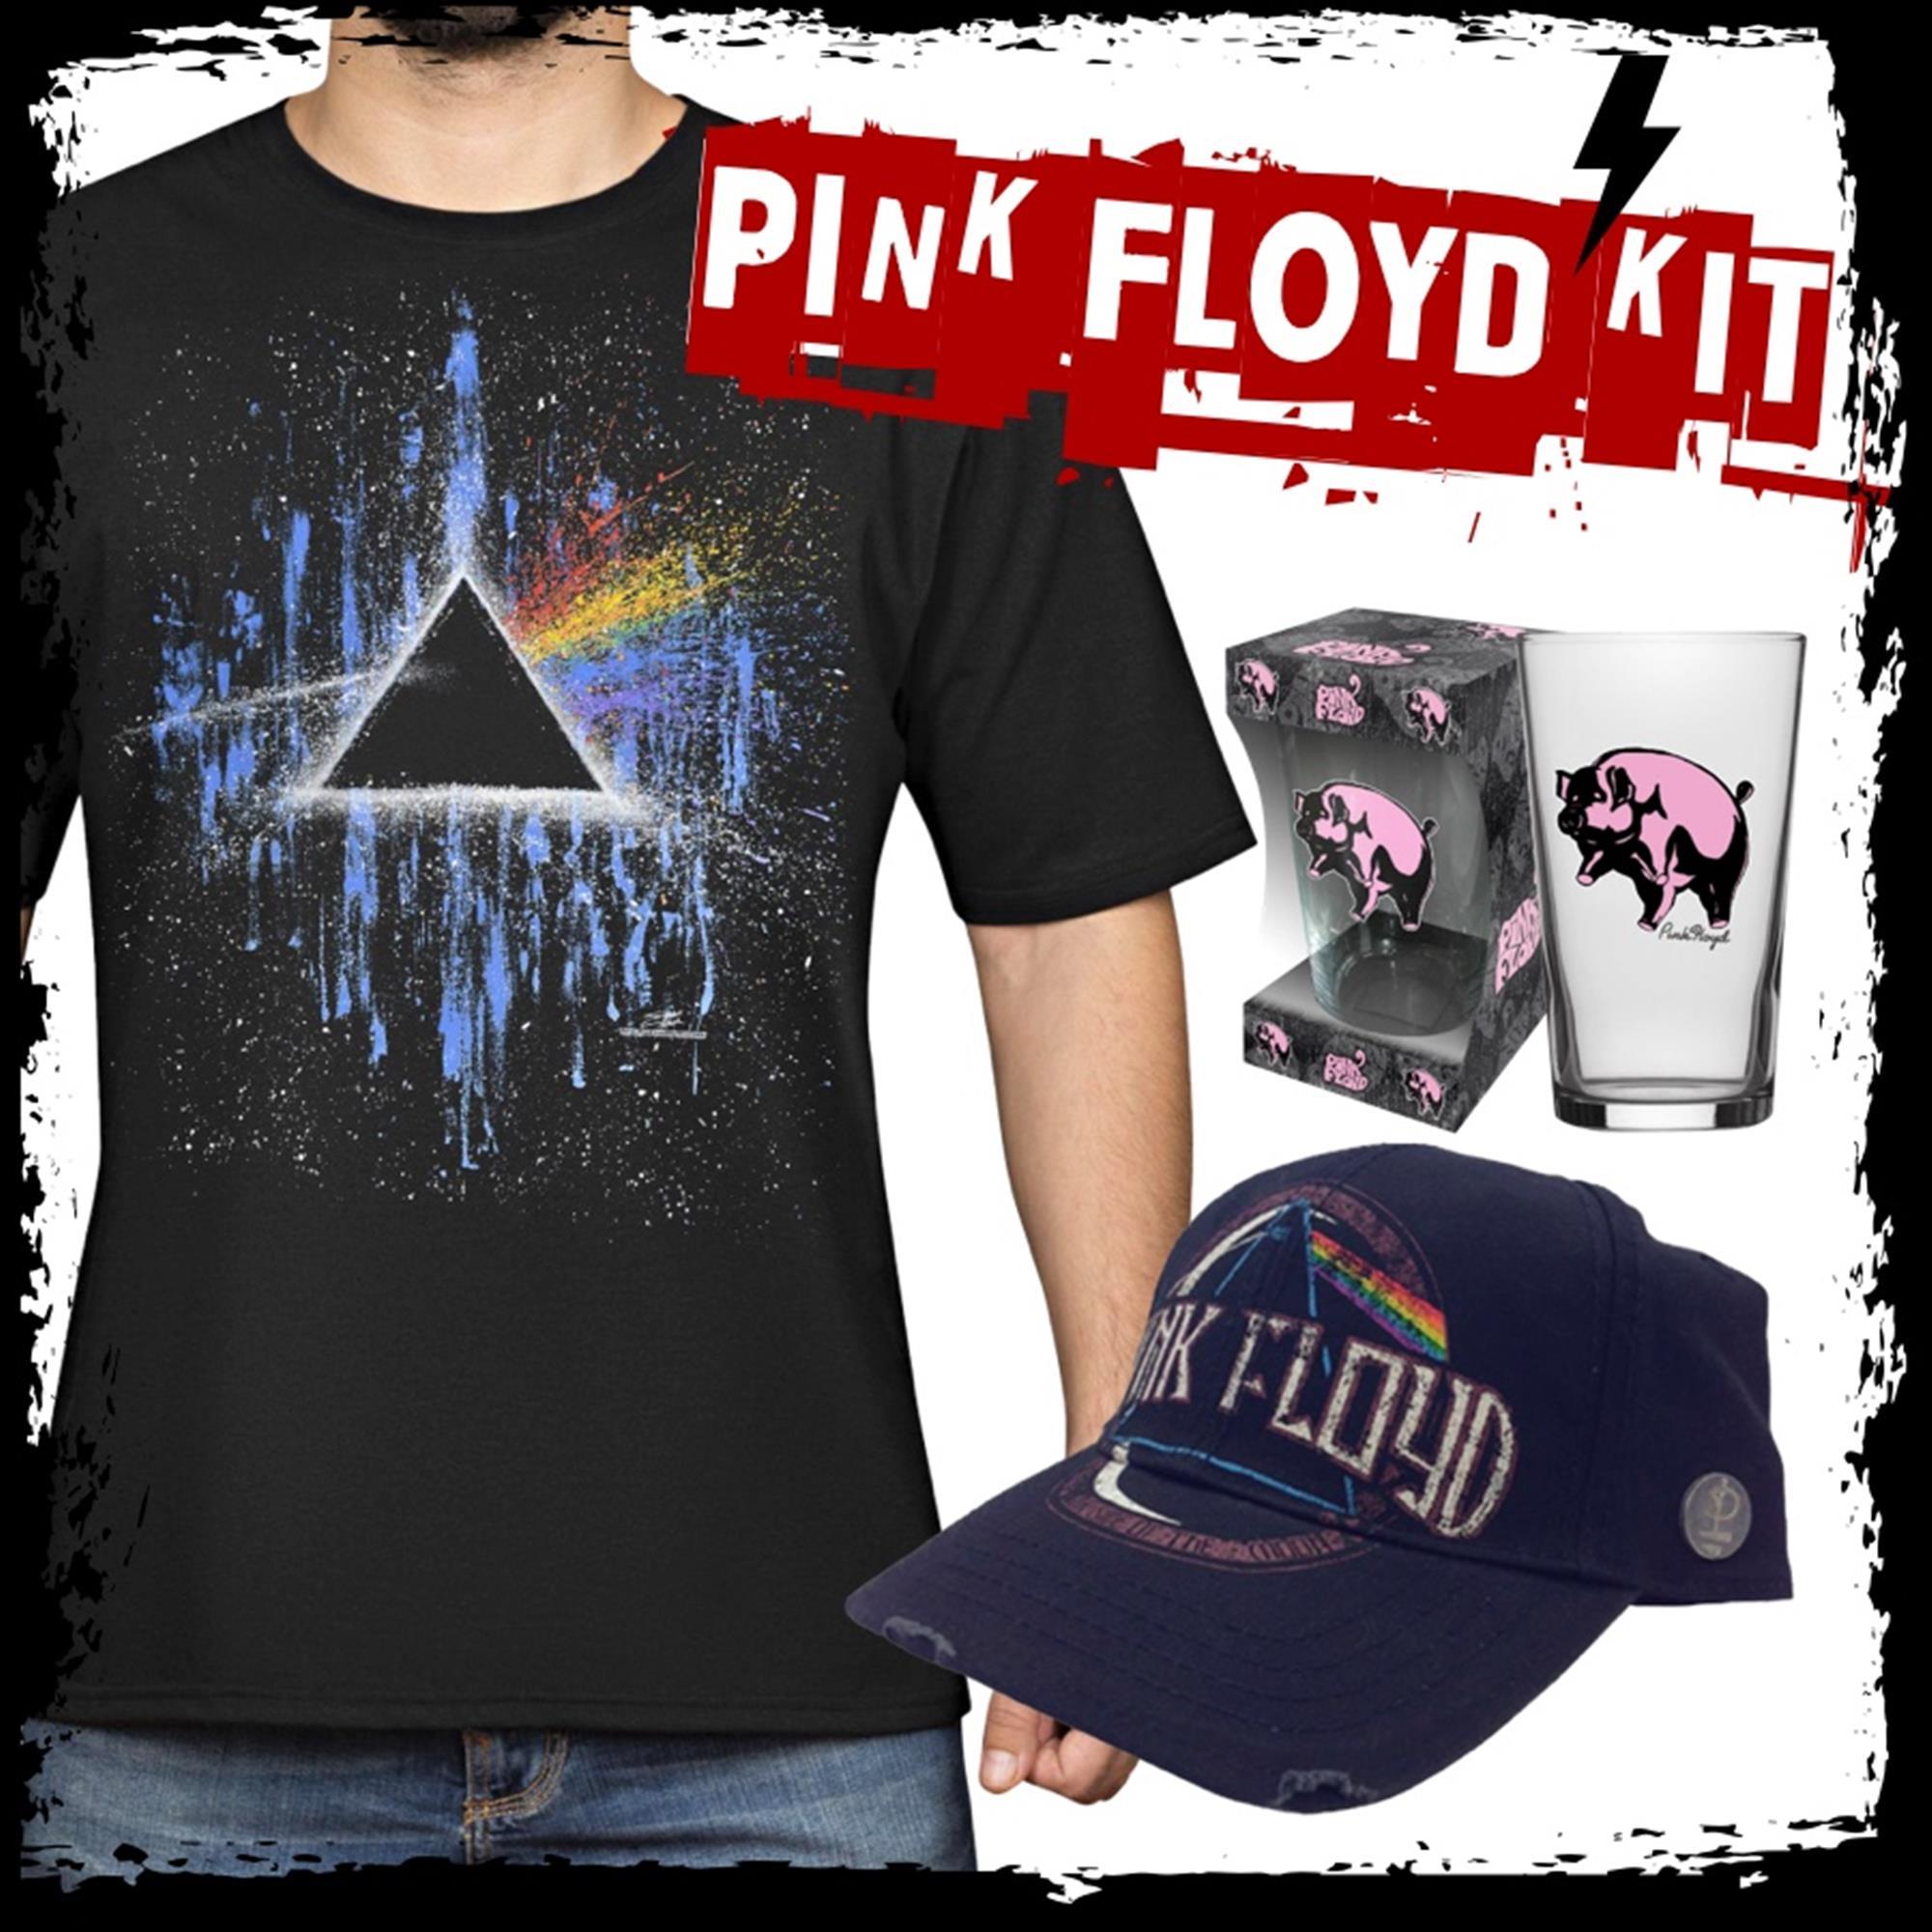 PINK FLOYD KIT